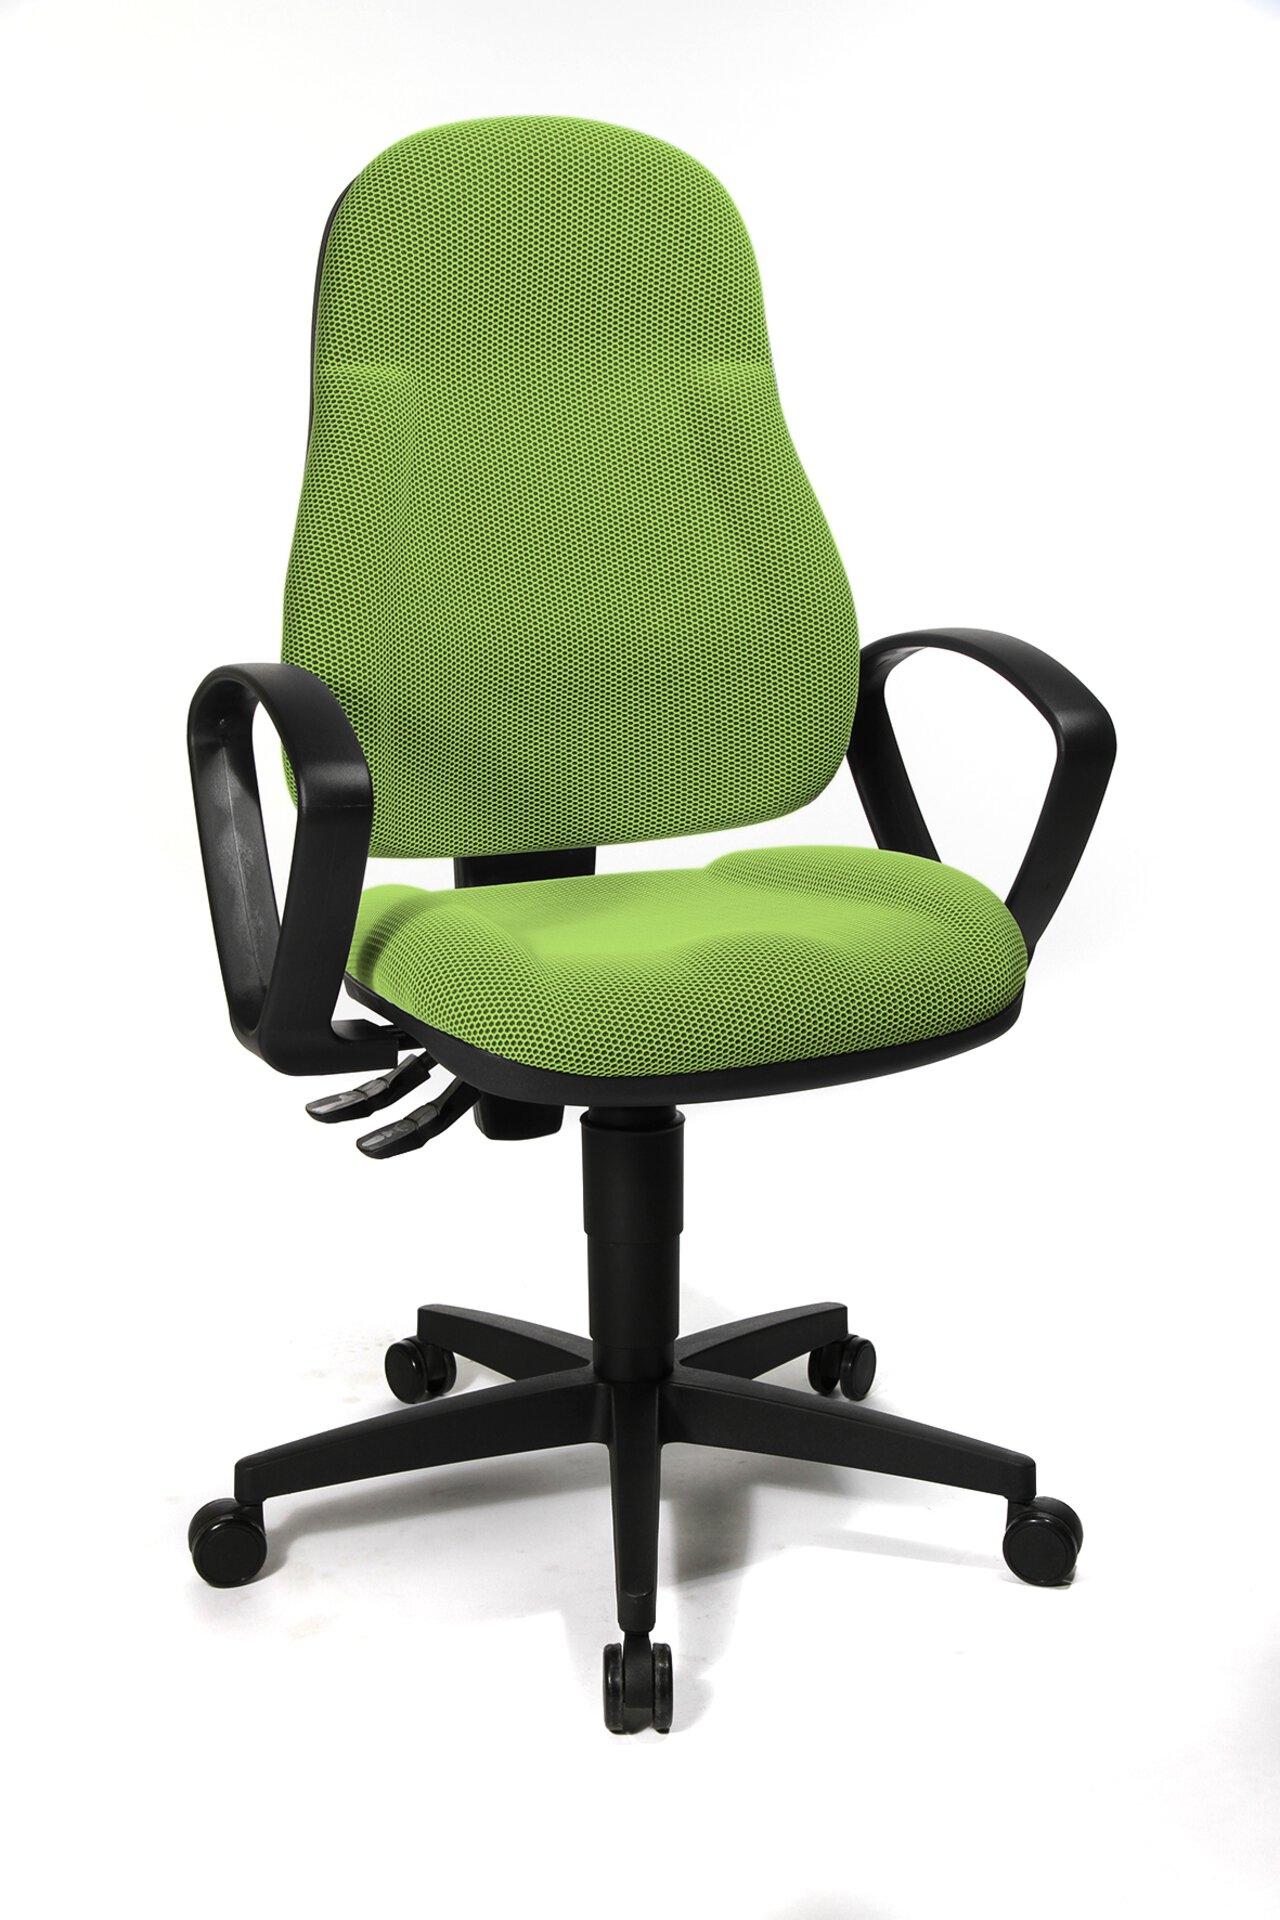 Büro-Drehstuhl WELLPOINT Topstar Textil grün 45 x 118 x 46 cm